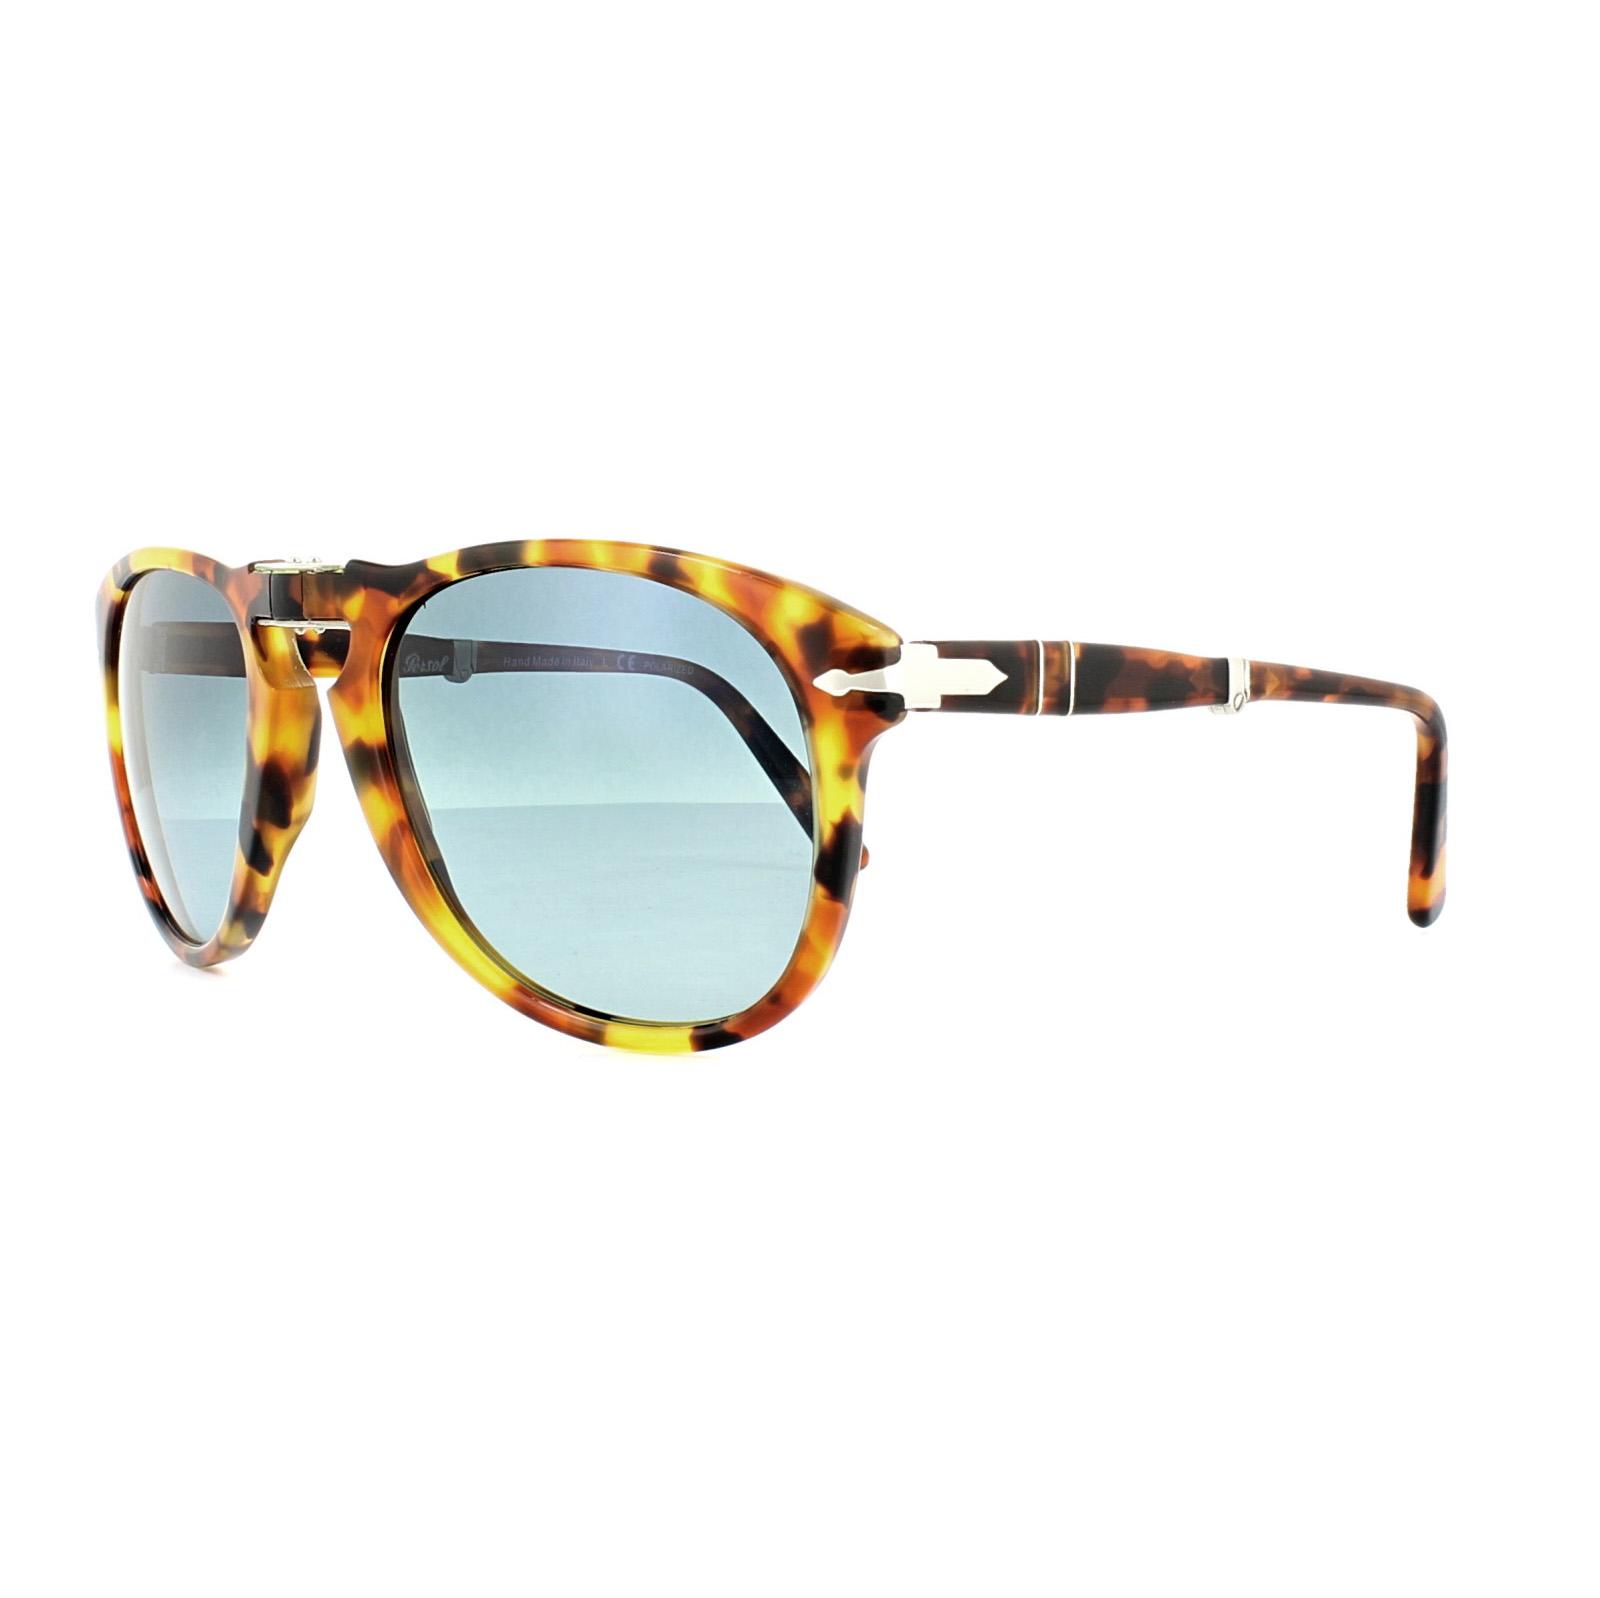 4820bc4fa98d0 Sentinel Persol Sunglasses 0714 1052S3 Madreterra Dark Blue Gradient  Polarized